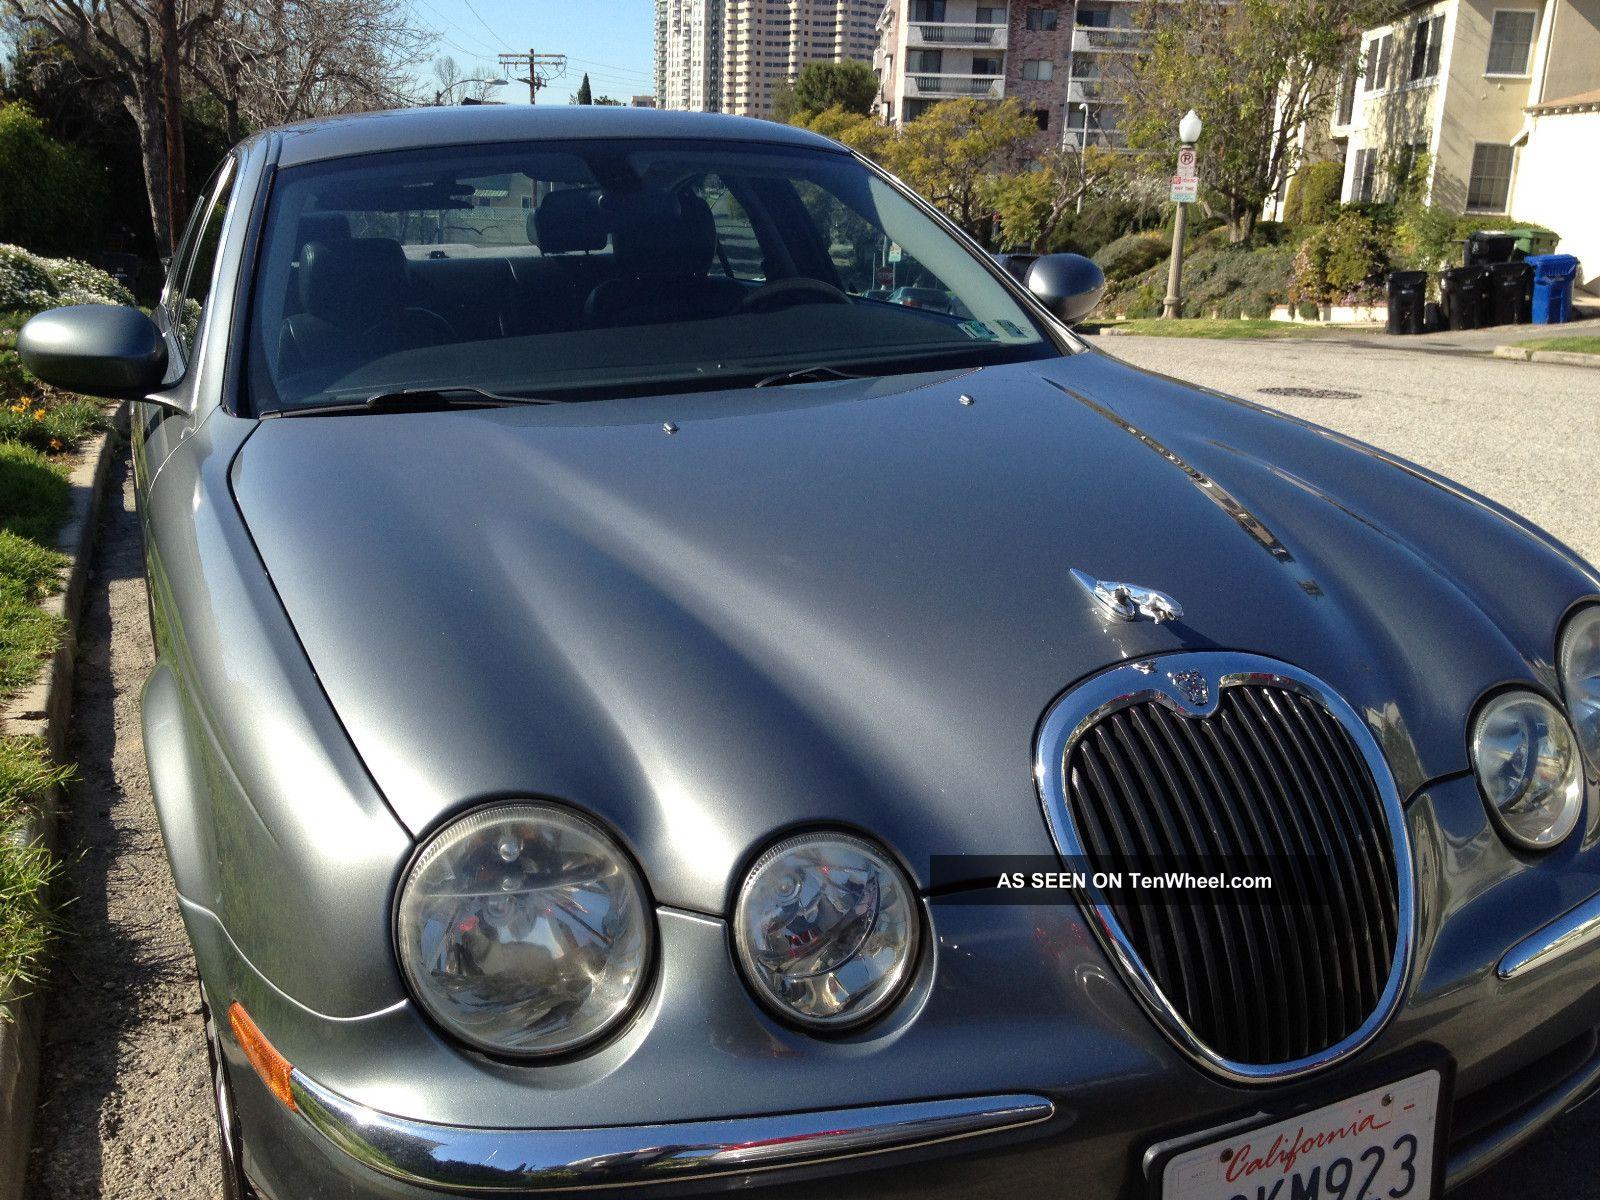 2003 jaguar s type v8 4 2l 4 door gray exterior black interior. Black Bedroom Furniture Sets. Home Design Ideas